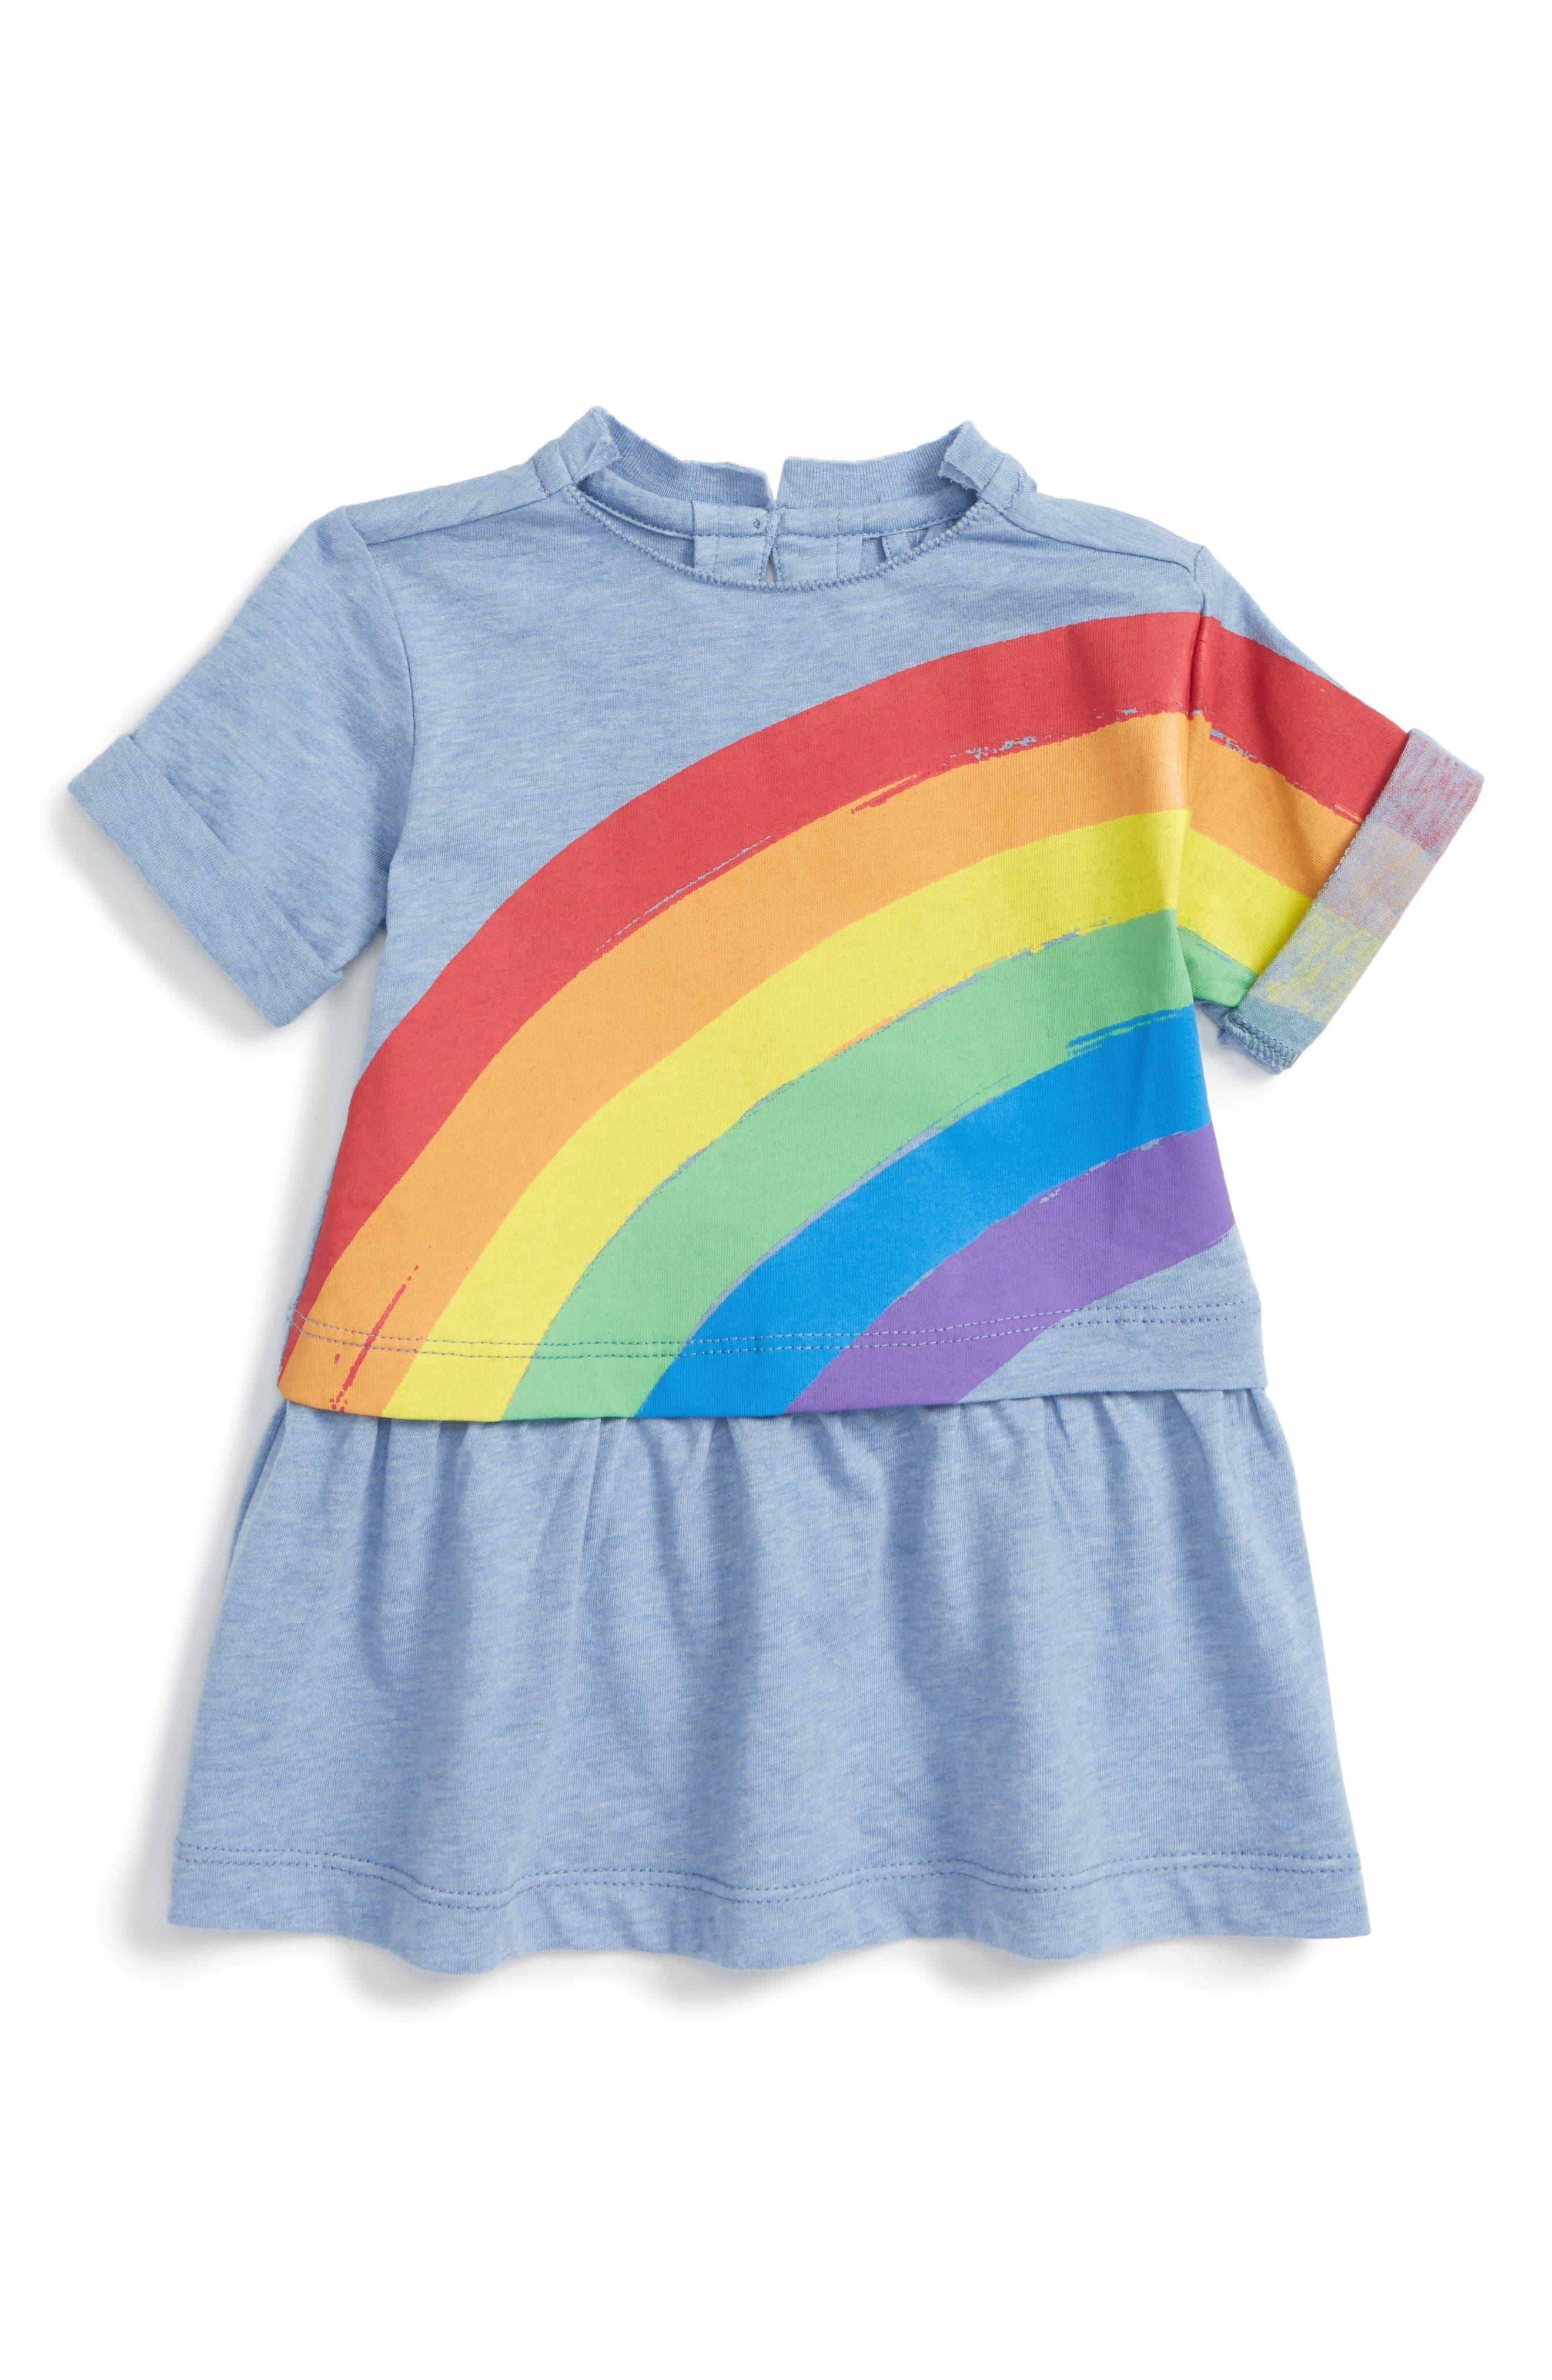 STELLA MCCARTNEY KIDS Jess Rainbow Dress